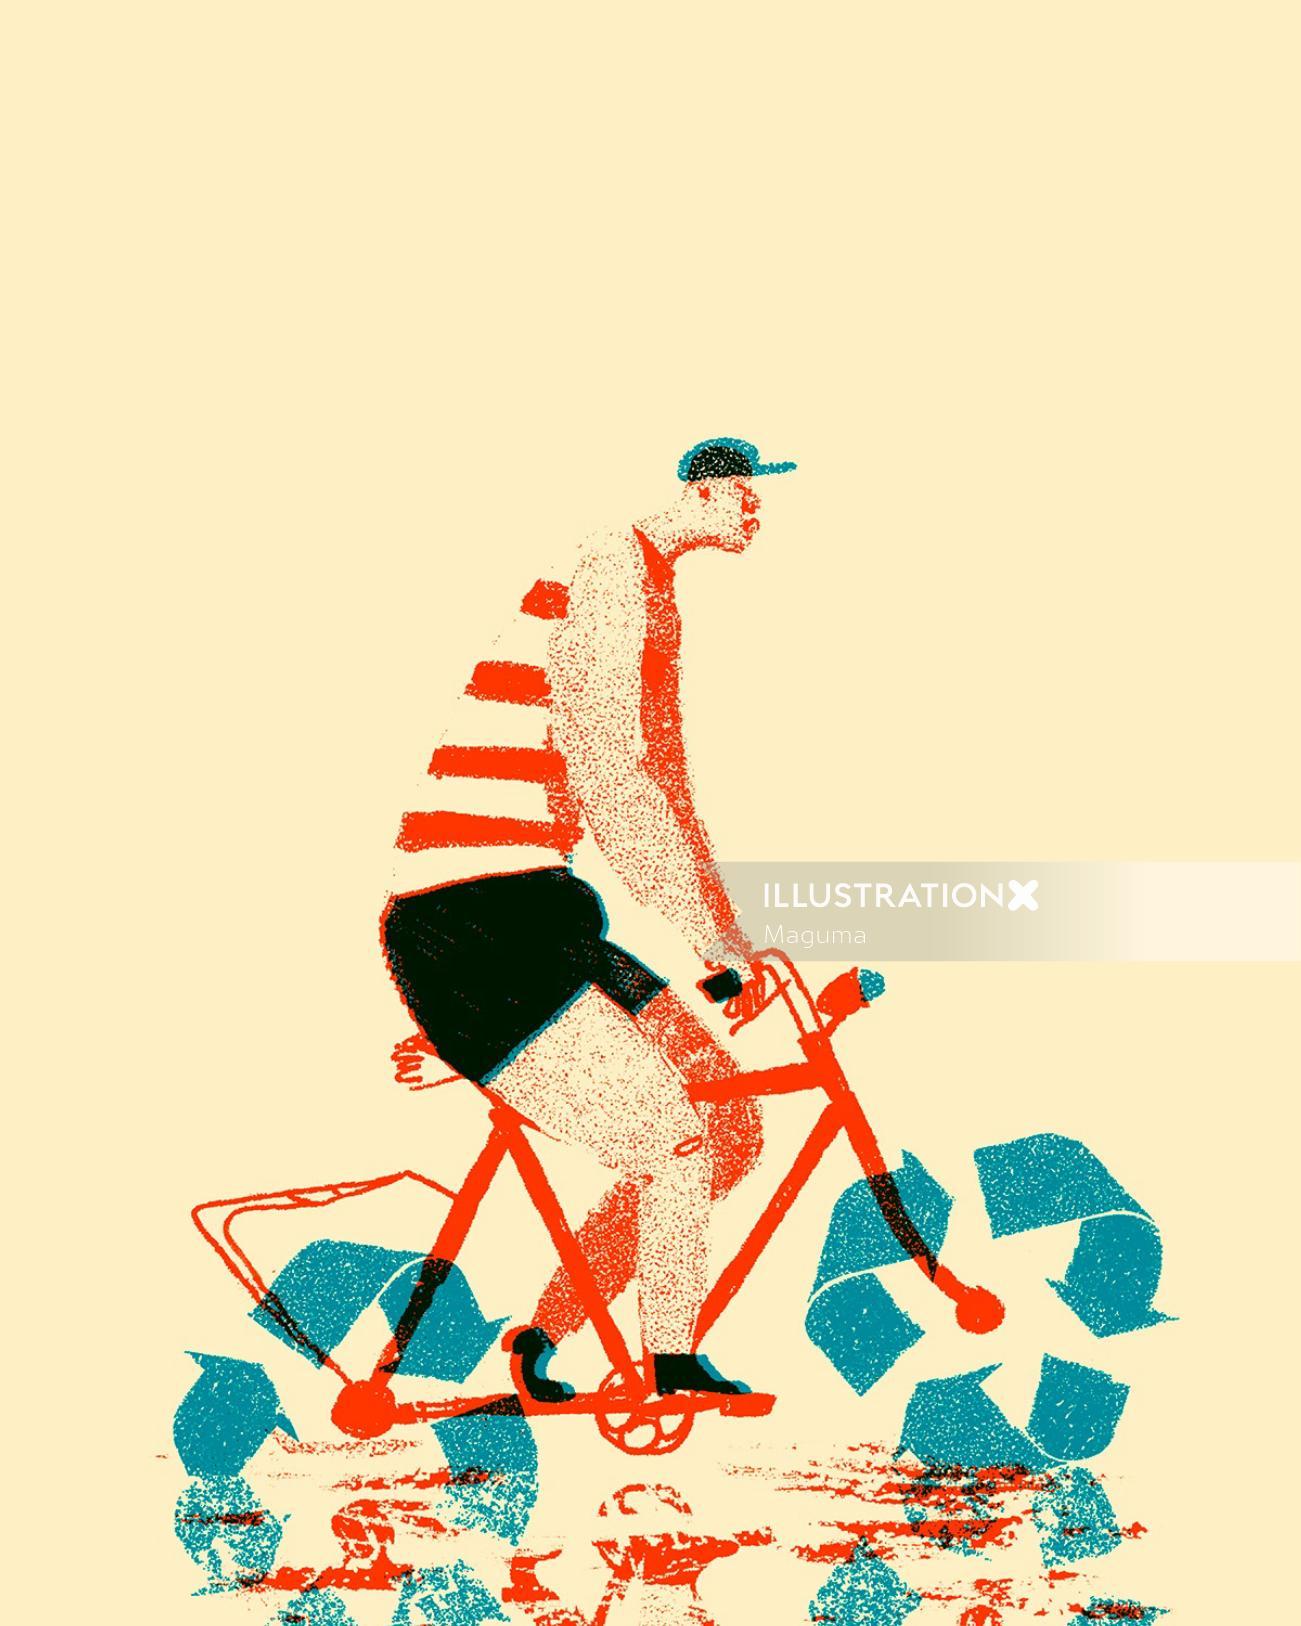 cycling through an ocean of alternatives